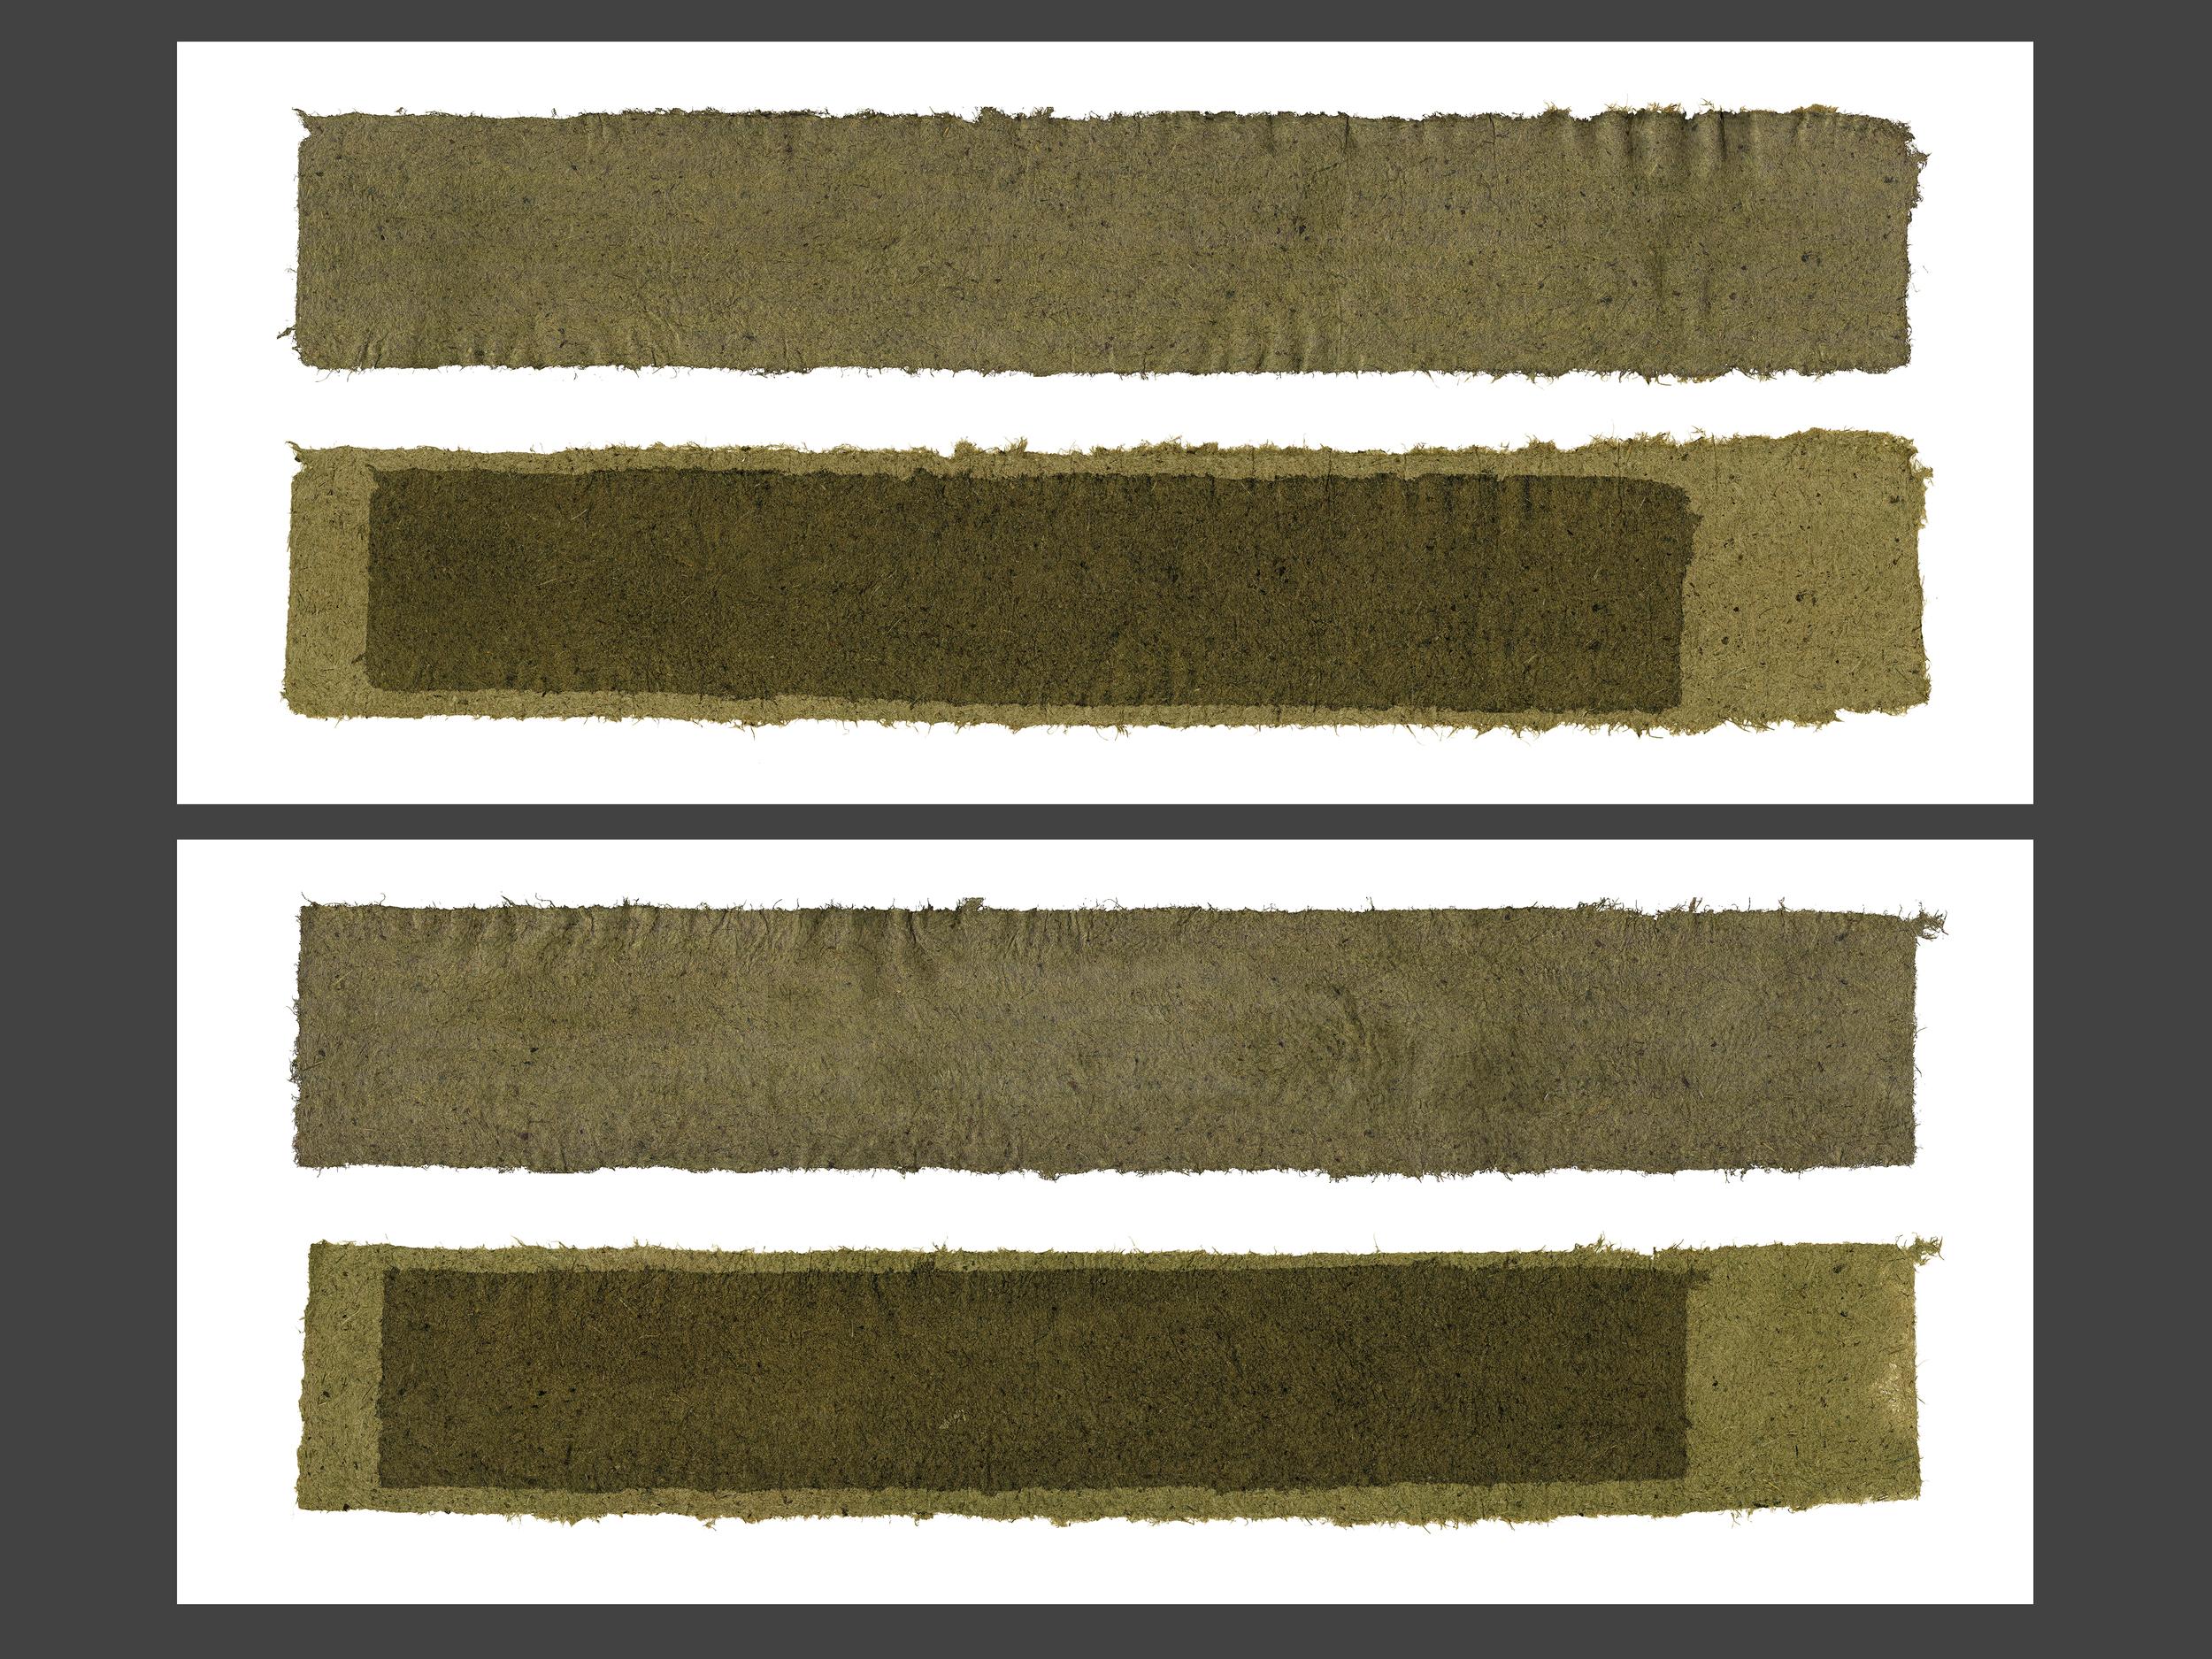 Grass Return Dyptick 1 and 2_2014.jpg